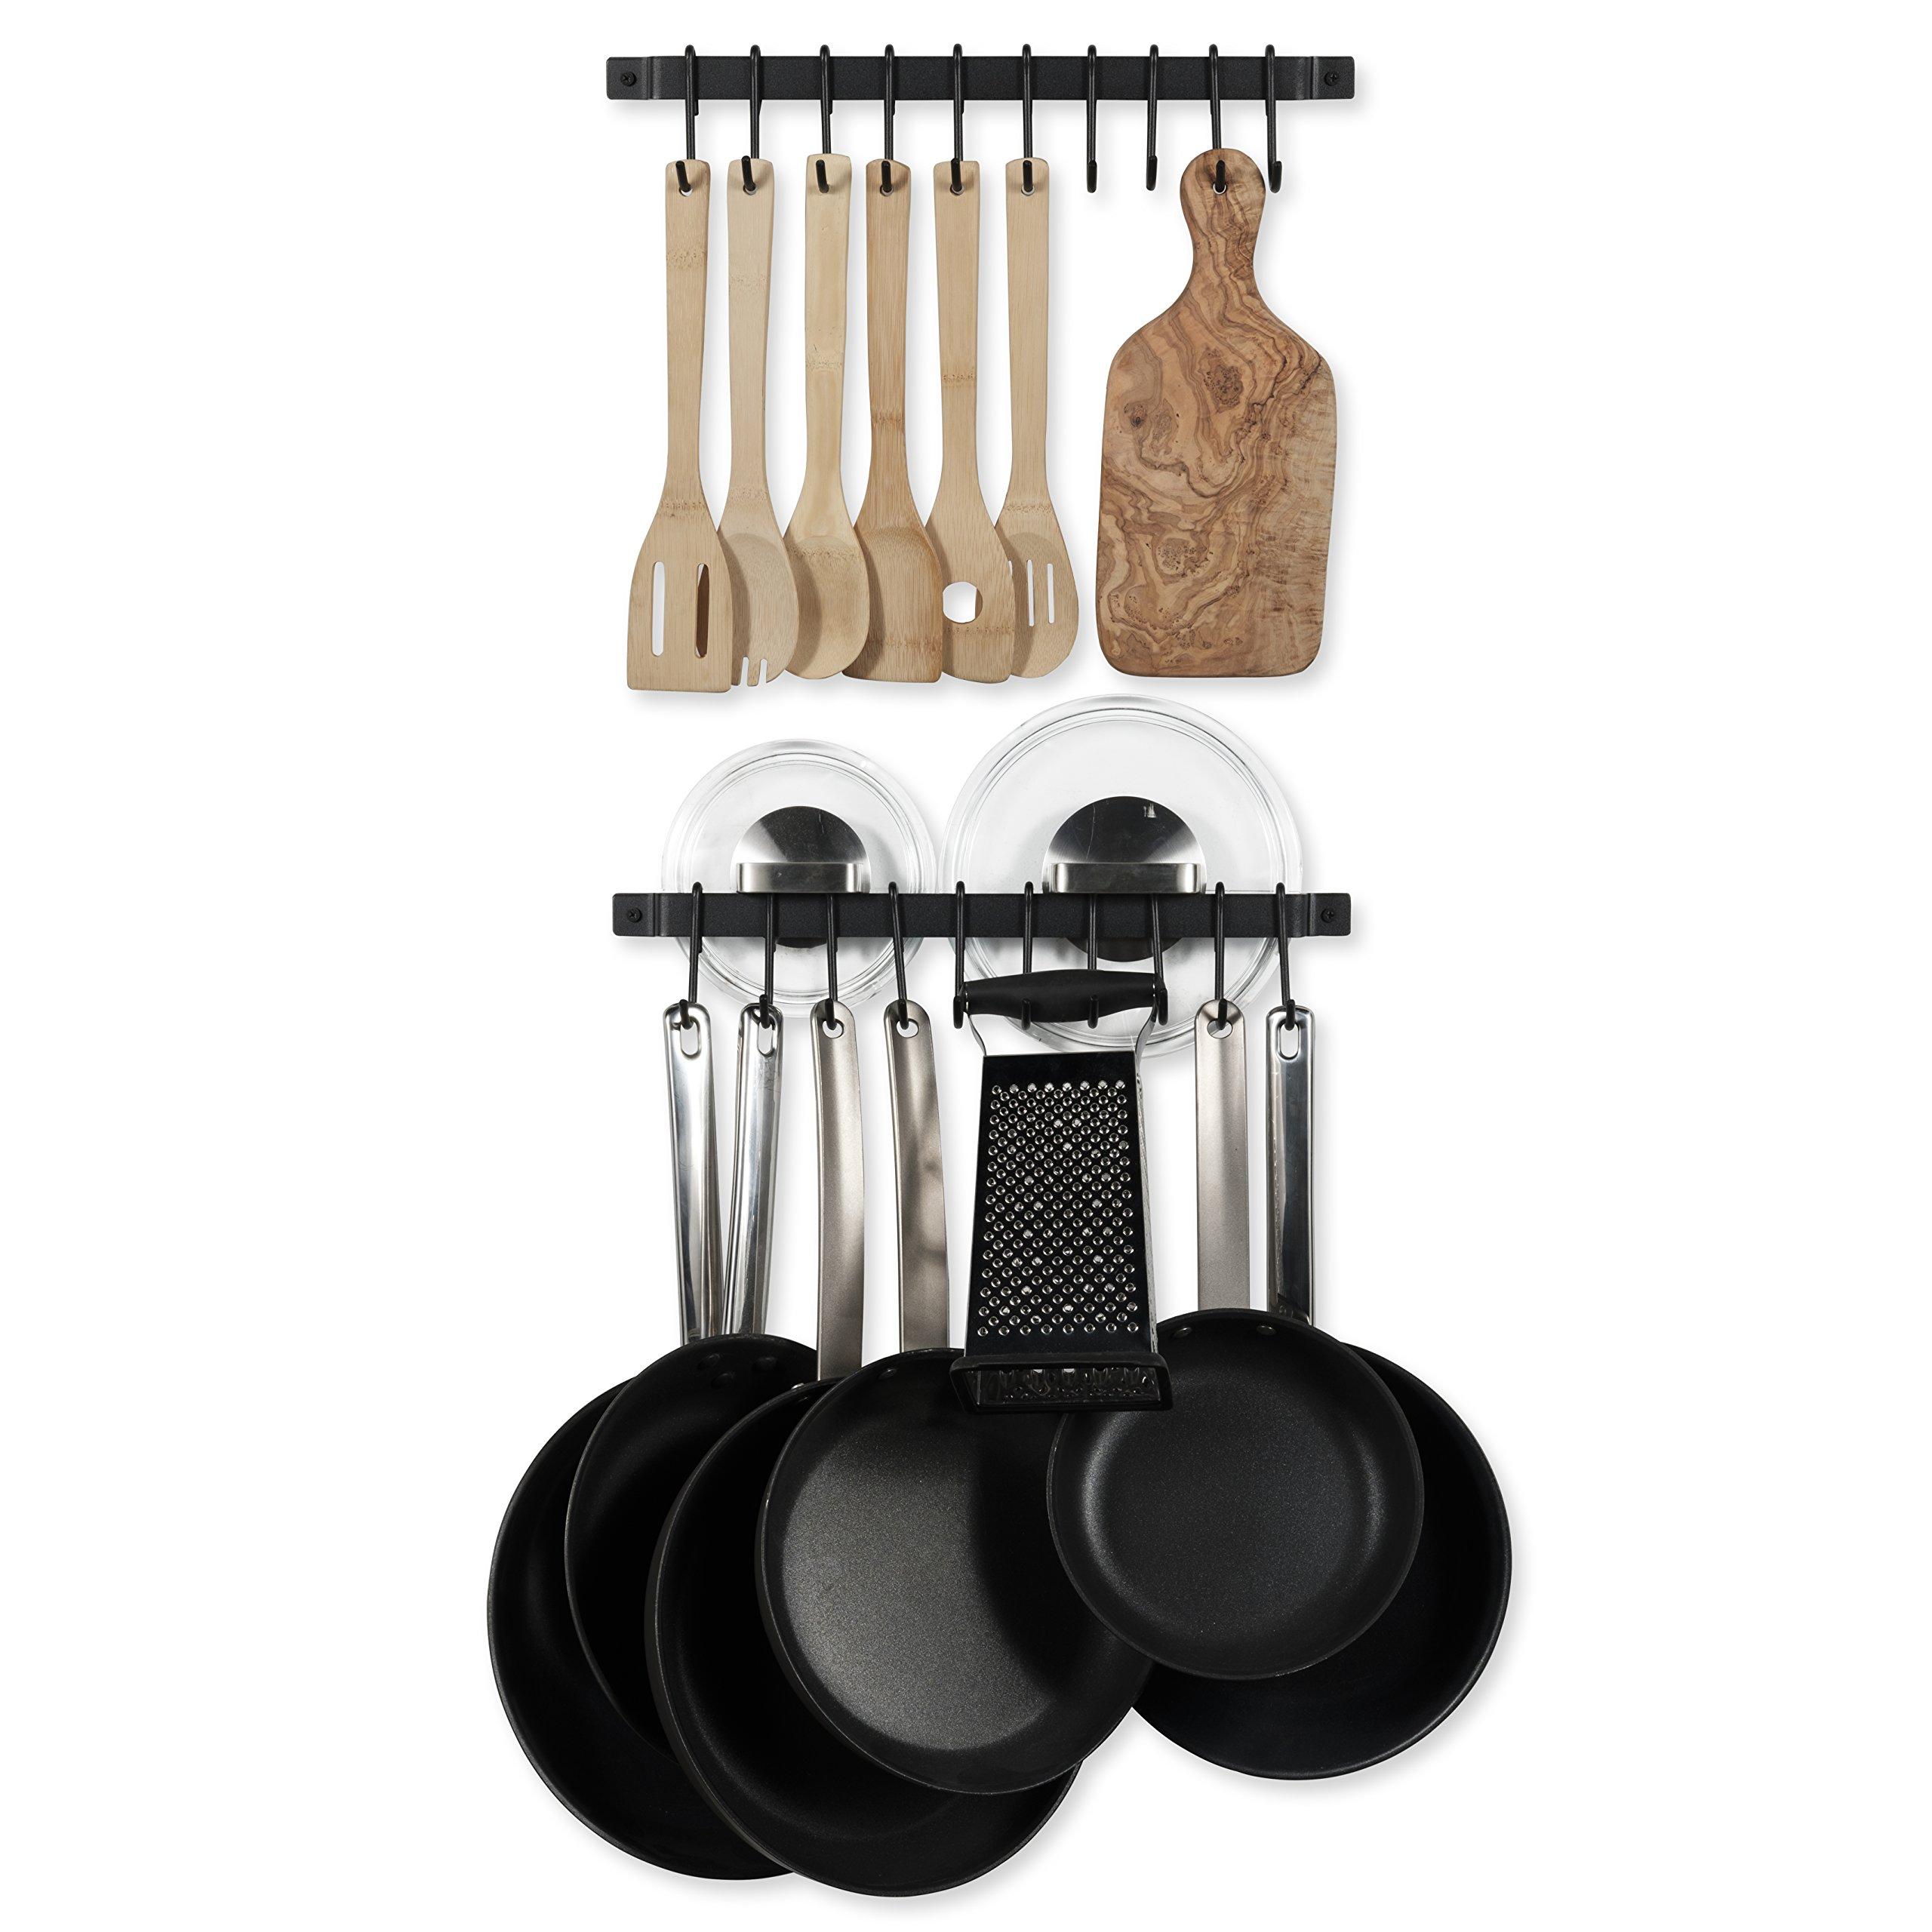 "WALLNITURE Gourmet Kitchen Rail Hanging Utensil Organizer Rack with Hooks Iron Black 17"" Inch Set of 2"